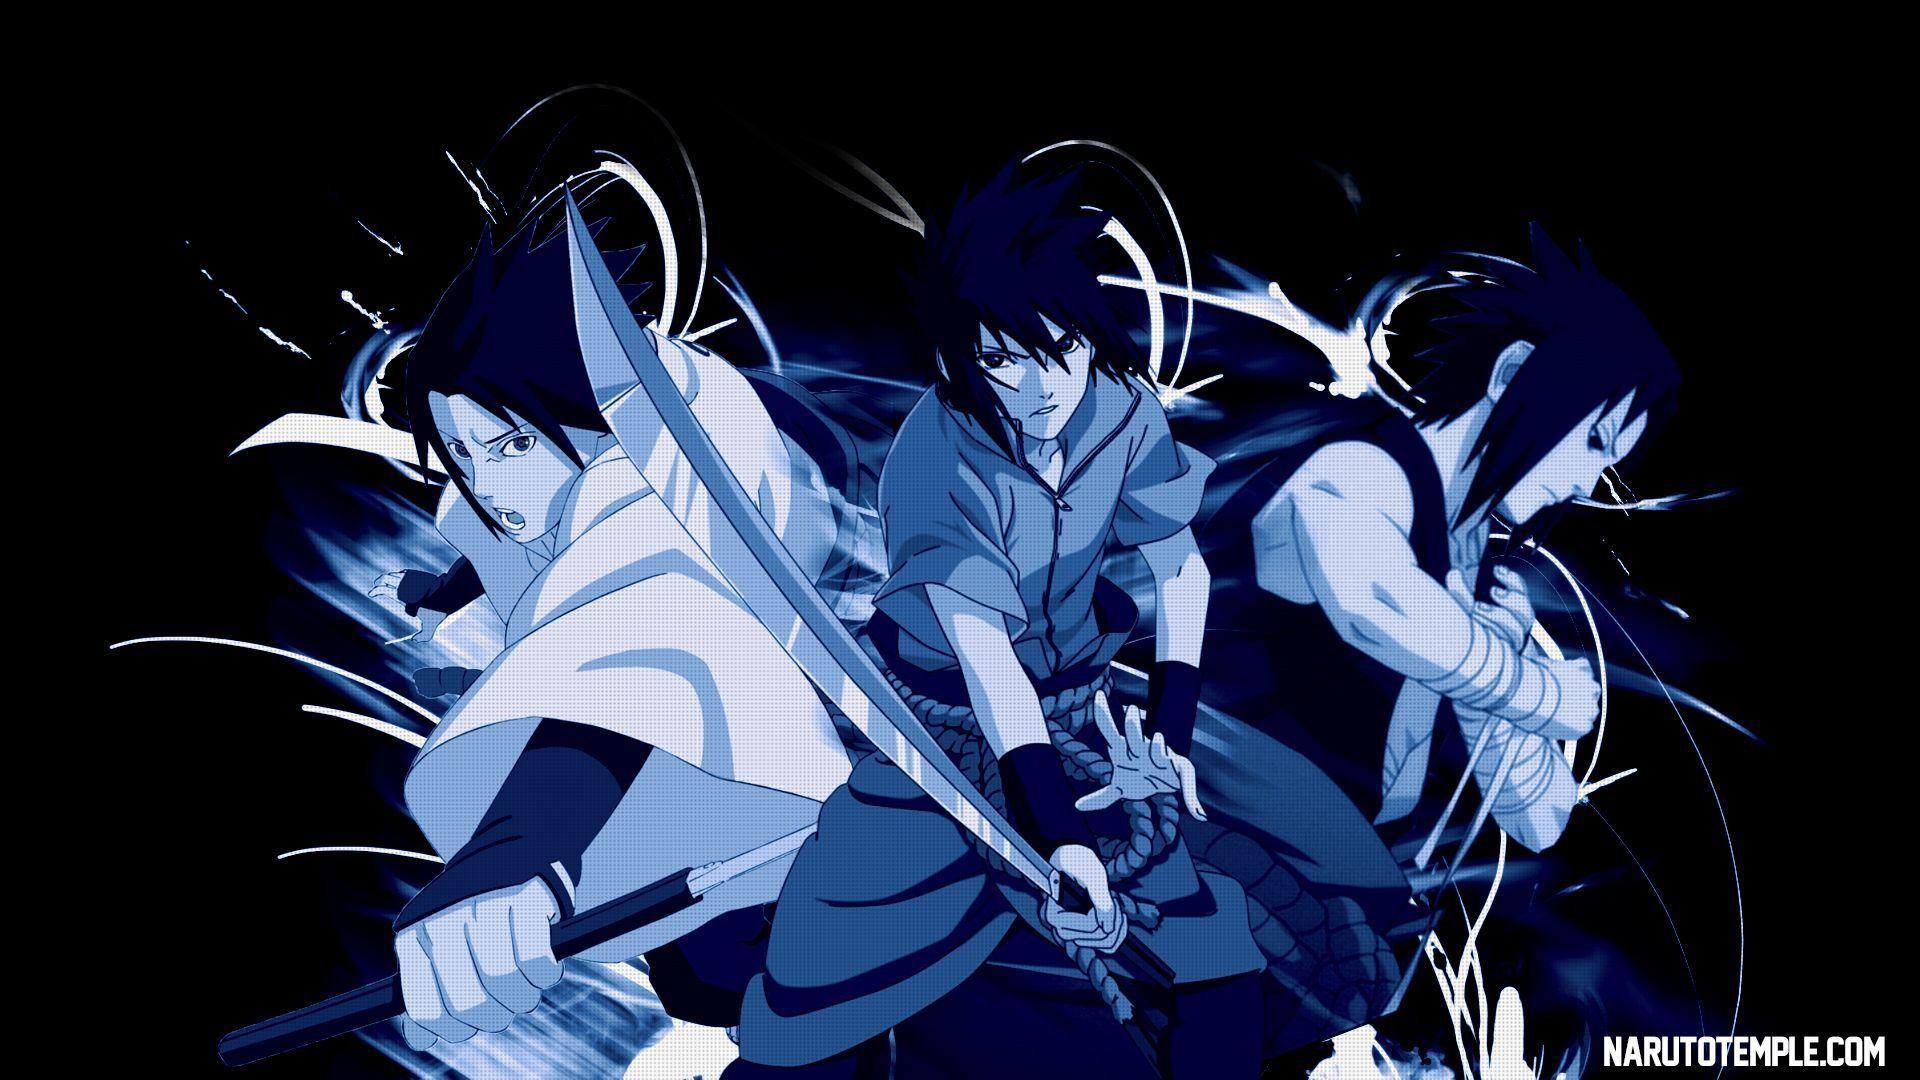 Download Sasuke Wallpaper Hd Sasuke Wallpaper Download 438582